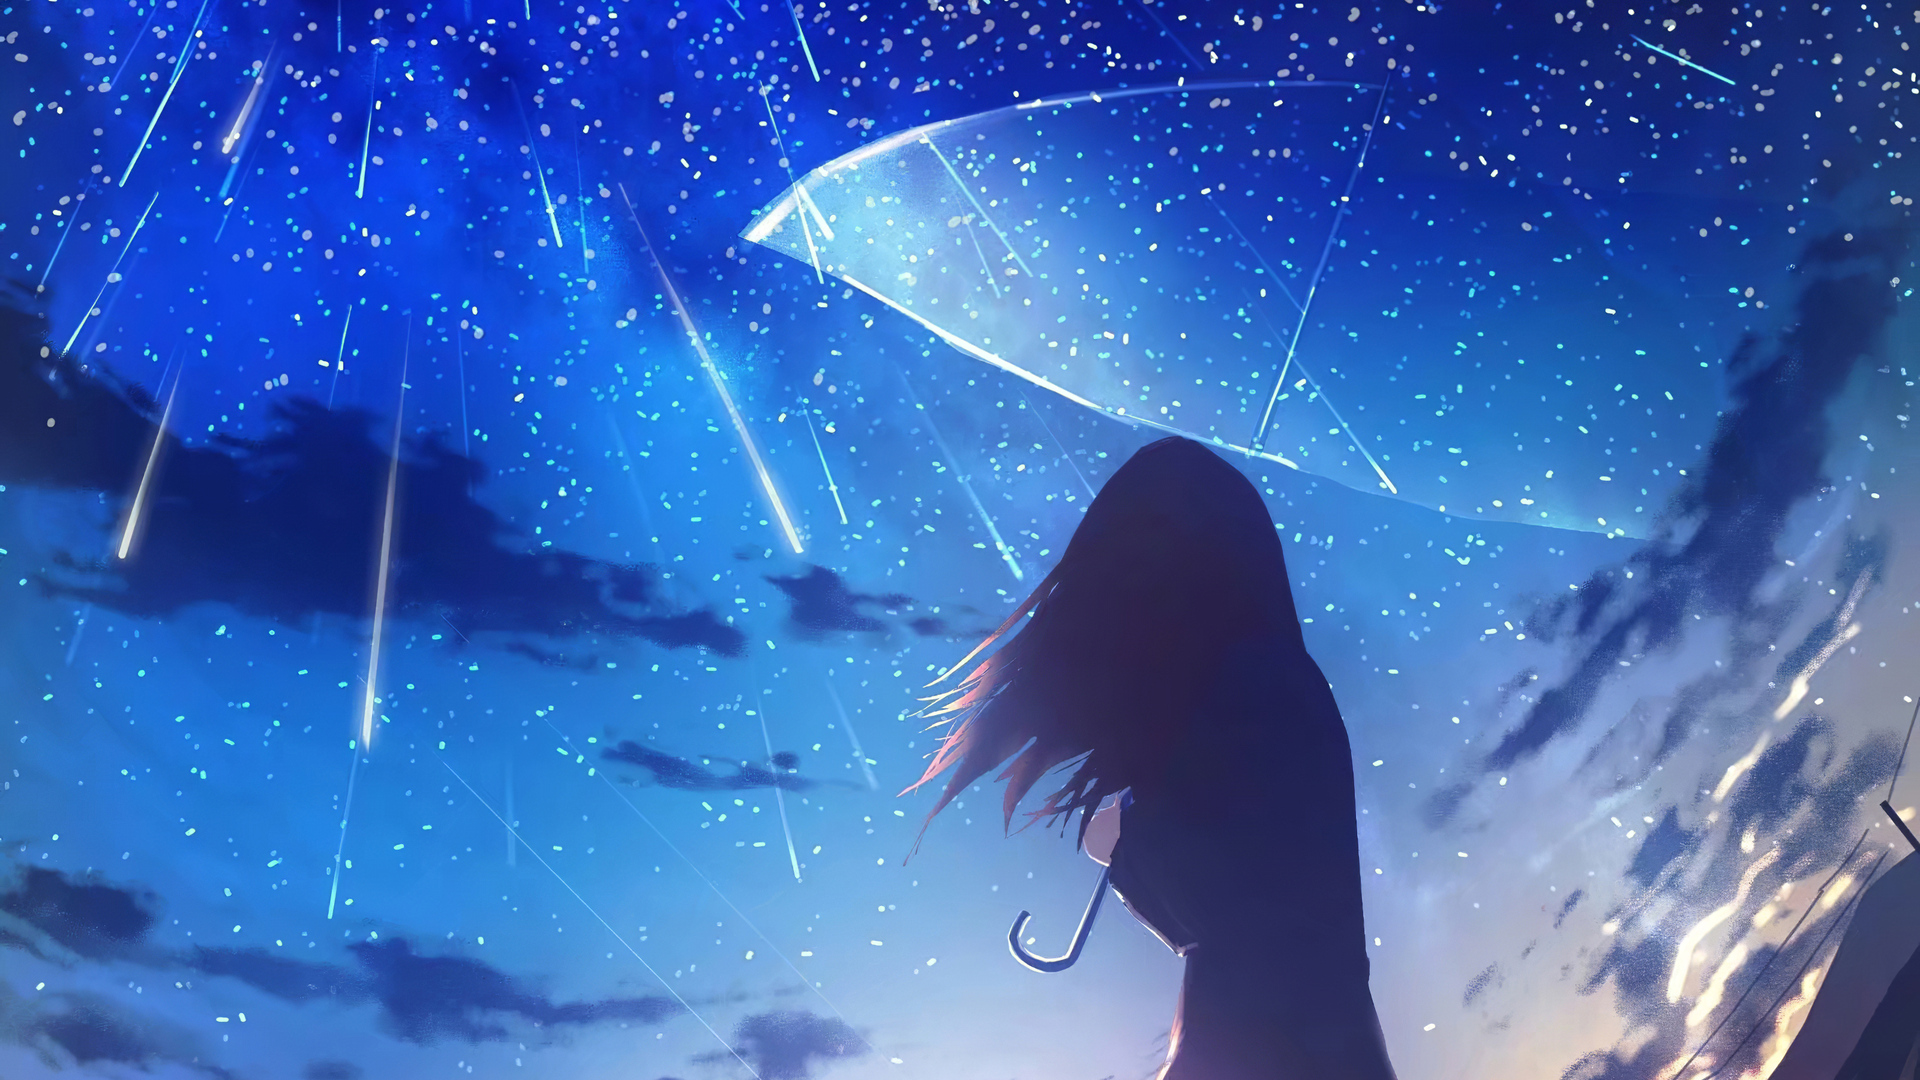 1920x1080 Anime Girl Umbrella Rain 4k Laptop Full HD 1080P ...